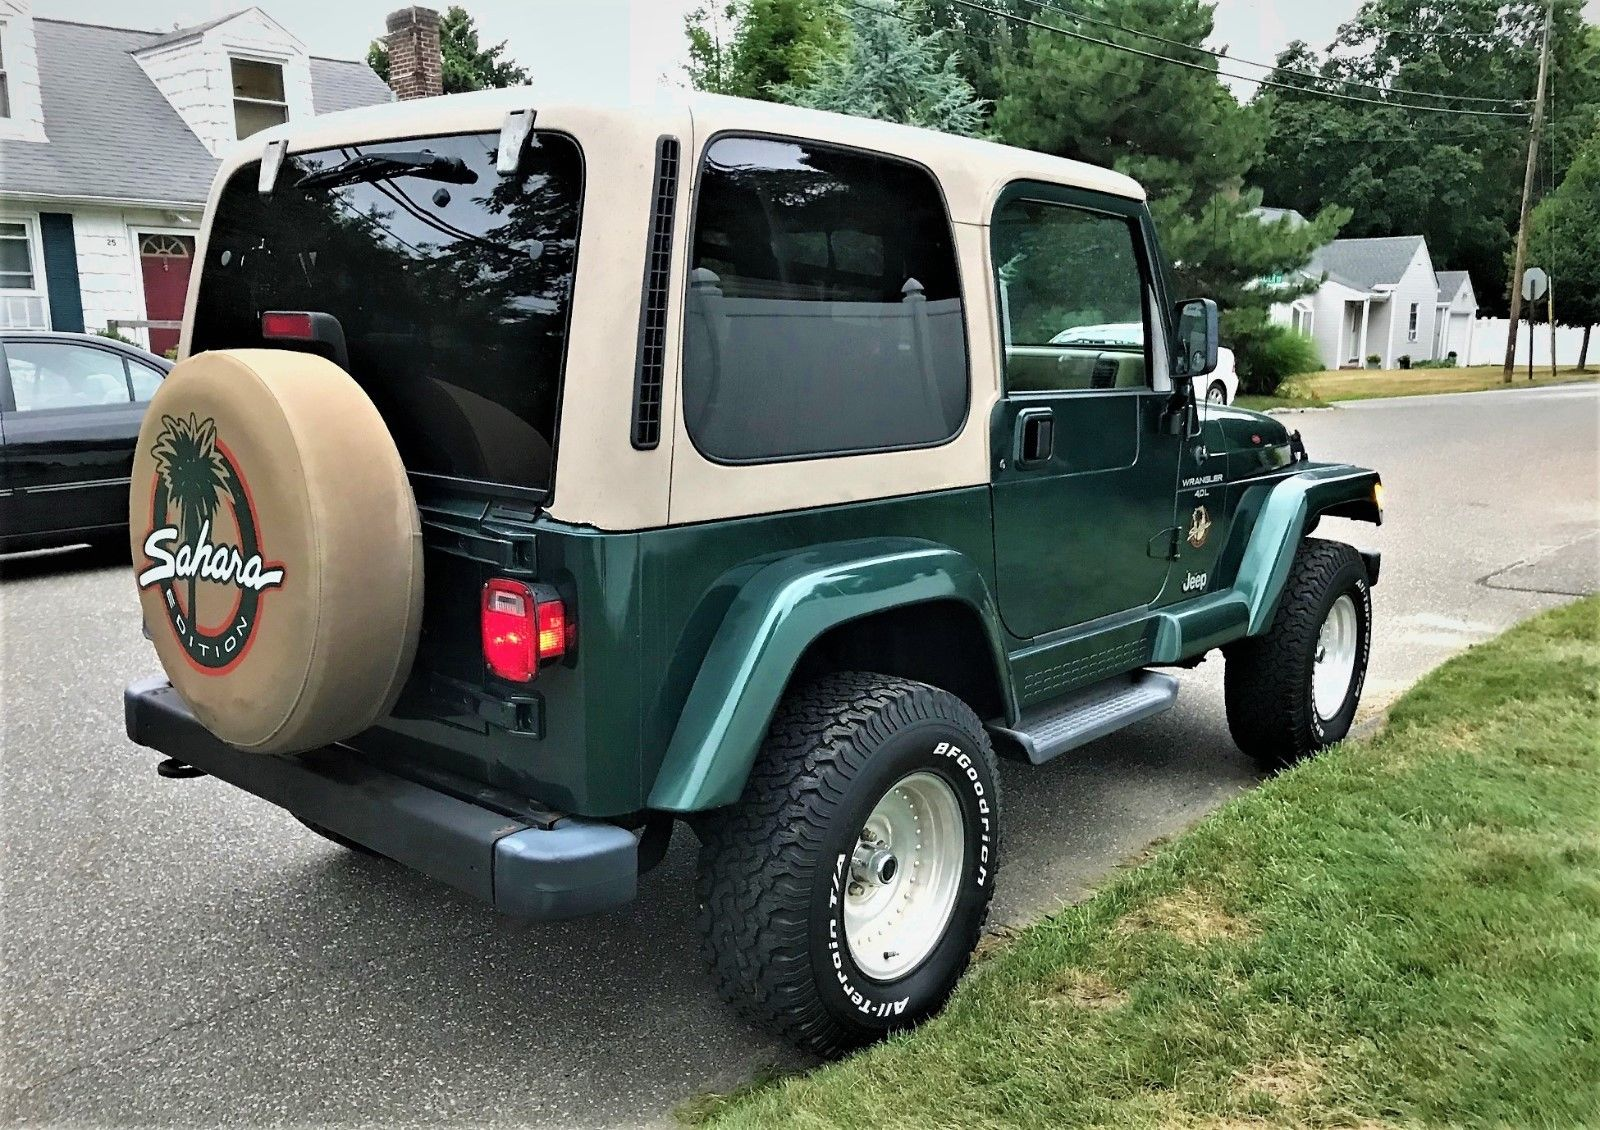 Awesome 2001 Jeep Wrangler Sahara TJ 2001 Jeep Wrangler Sahara With Hard  And Soft Top Automatic 82K Miles 2018 2019